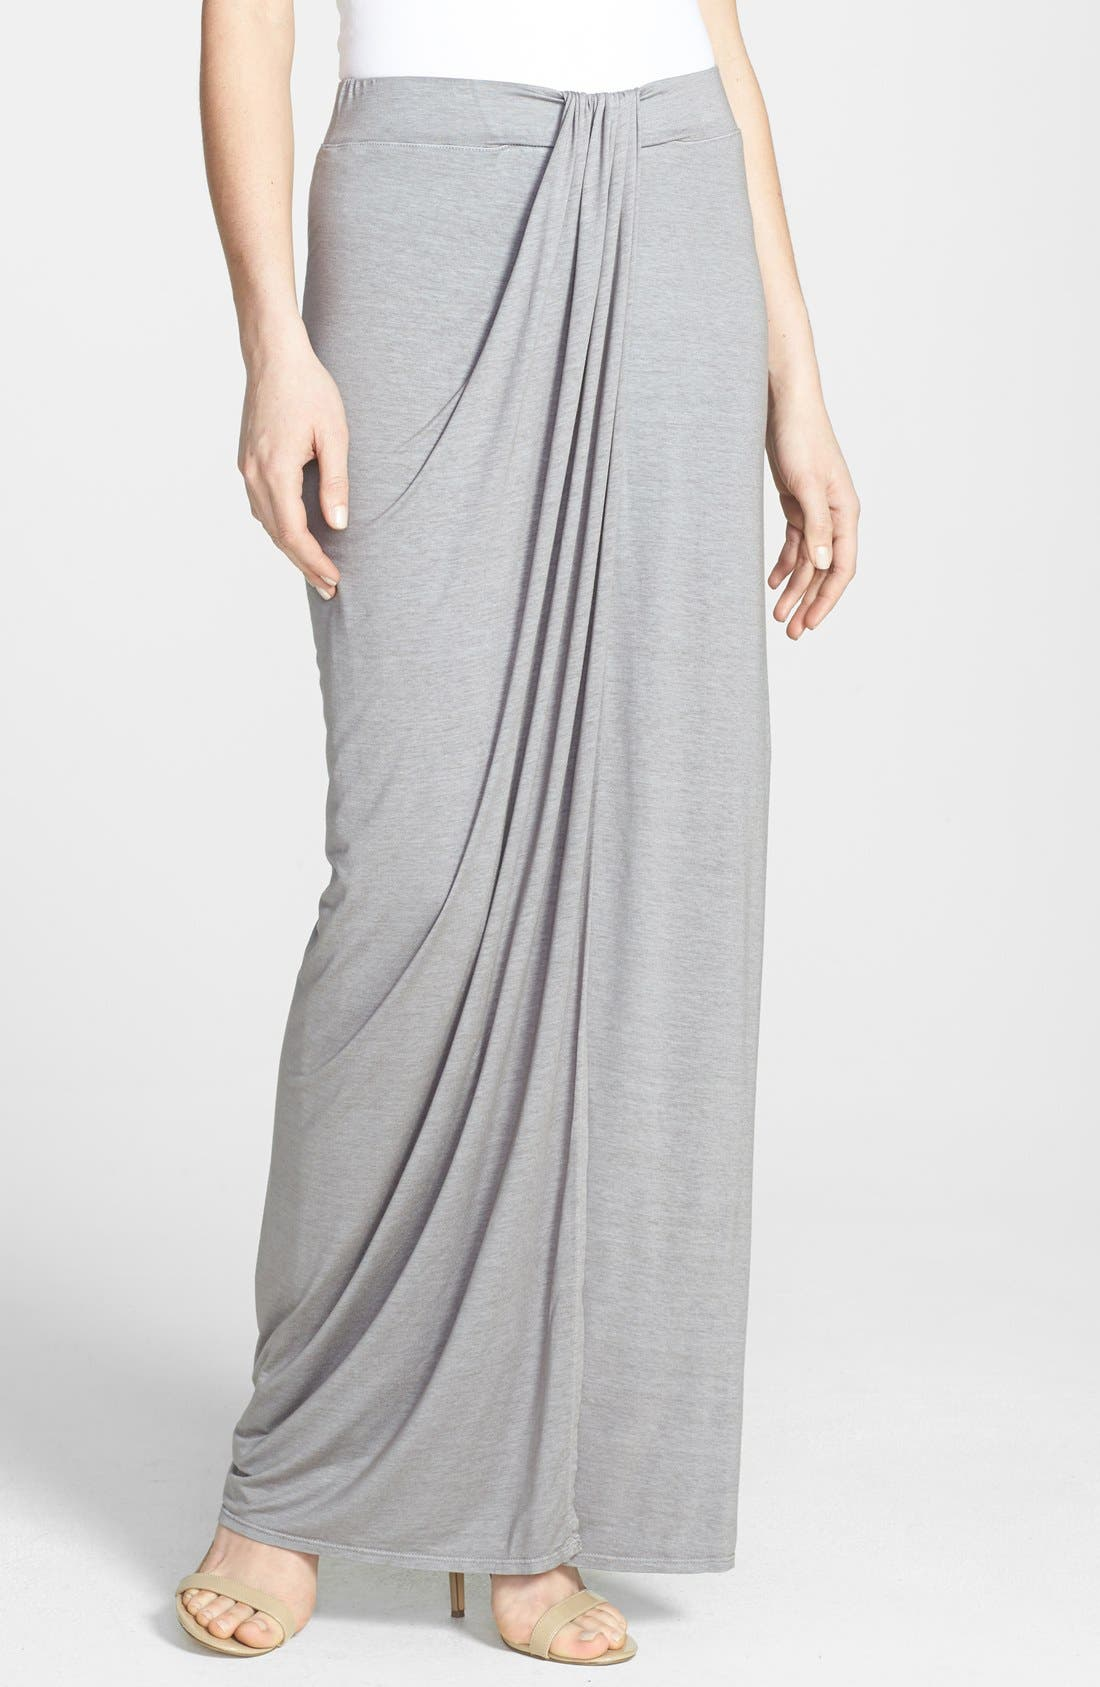 Alternate Image 1 Selected - Three Dots Drape Front Maxi Skirt